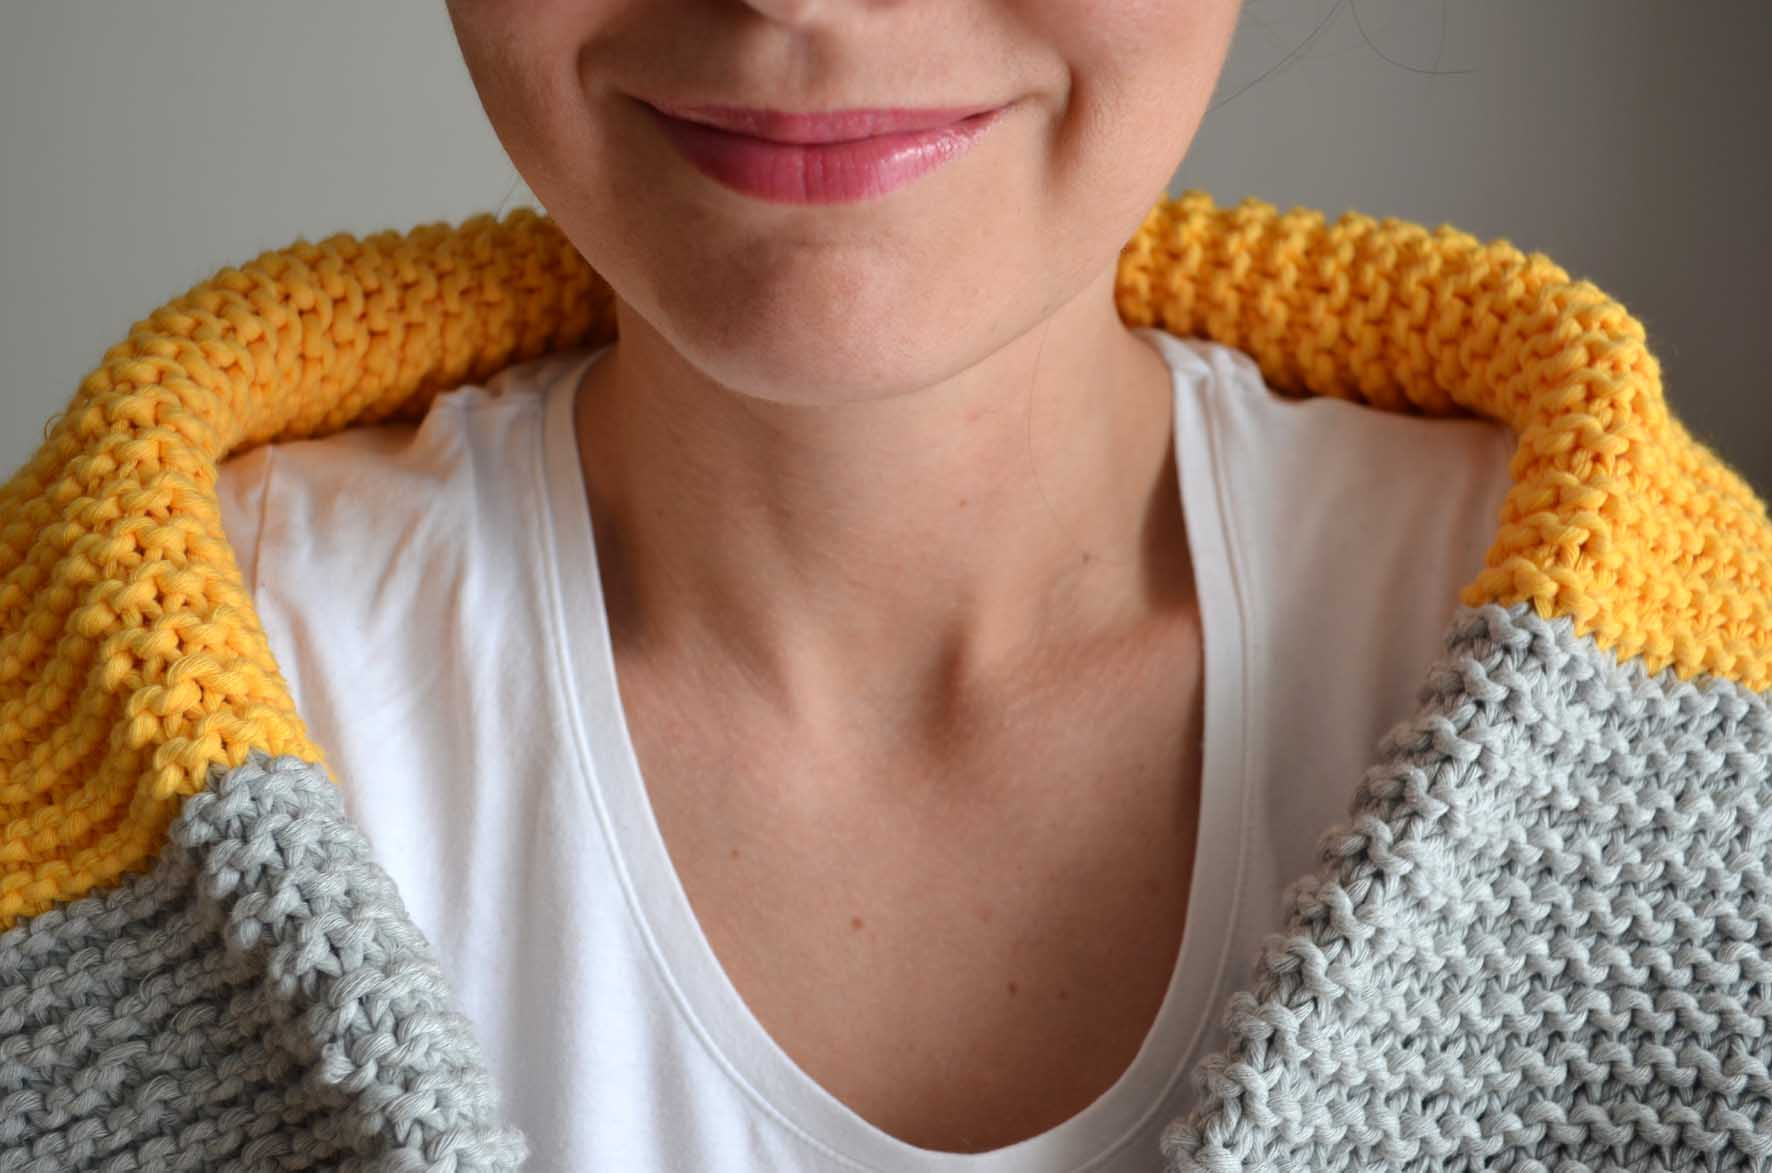 schema chausson basket tricot altoservices. Black Bedroom Furniture Sets. Home Design Ideas